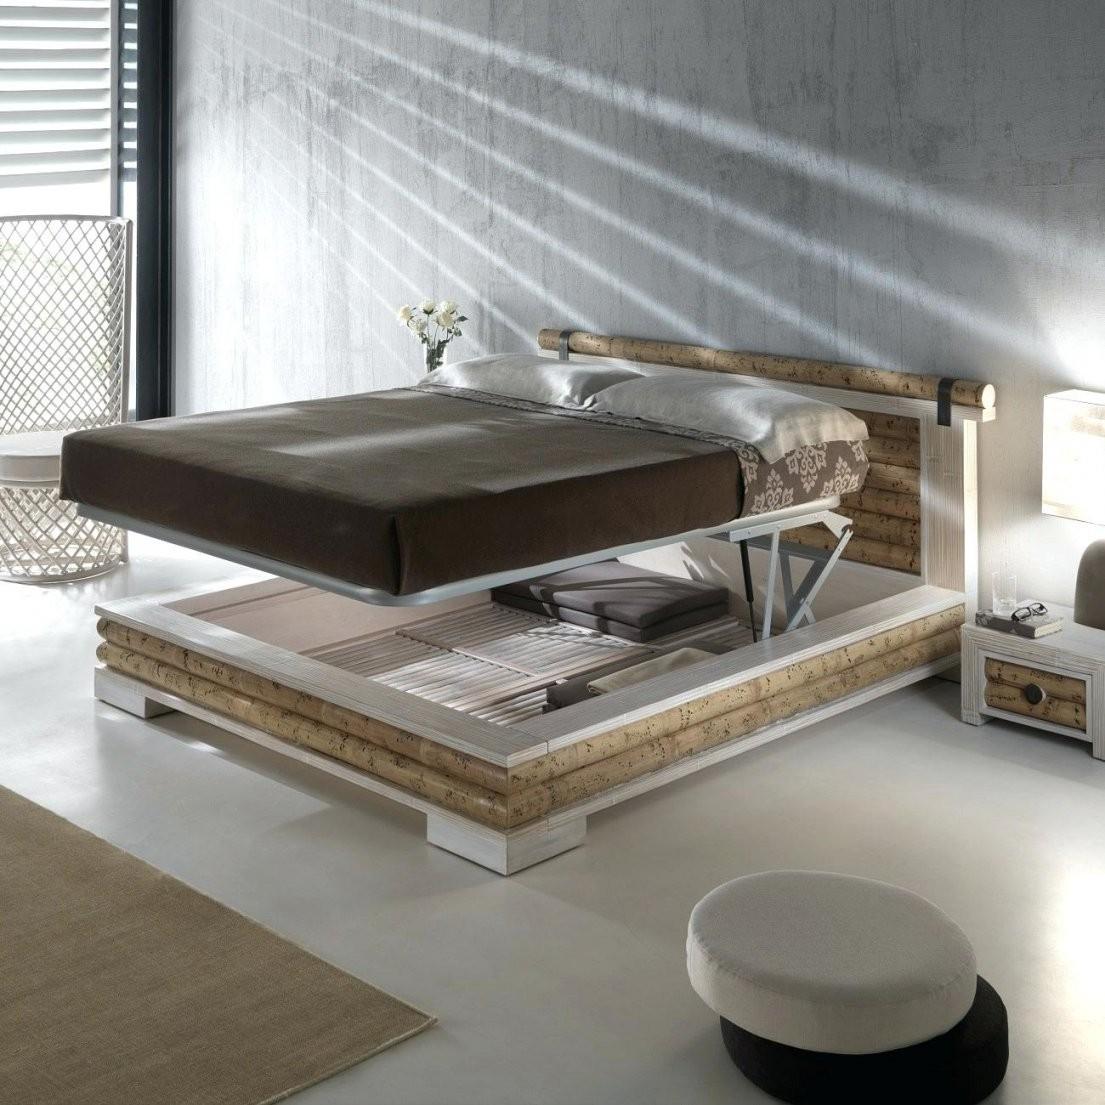 Enorm Doppelbetten Mit Bettkasten Doppelbett 180X200 Genial Bett von Doppelbett 180X200 Mit Bettkasten Bild